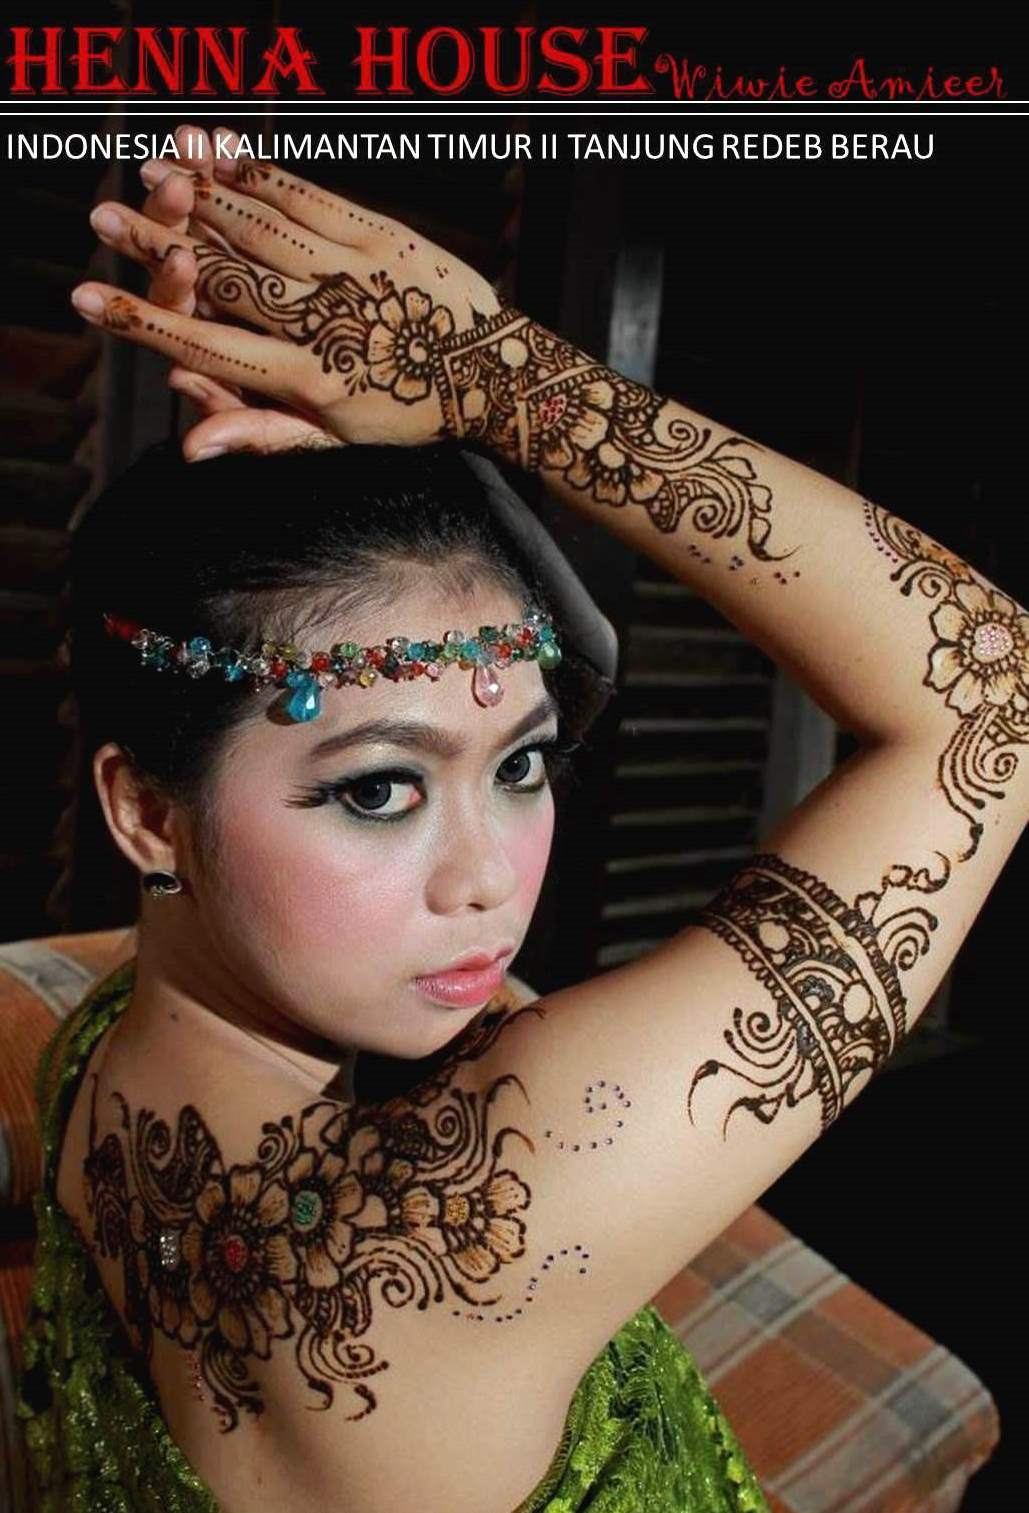 Henna House By Wiwie